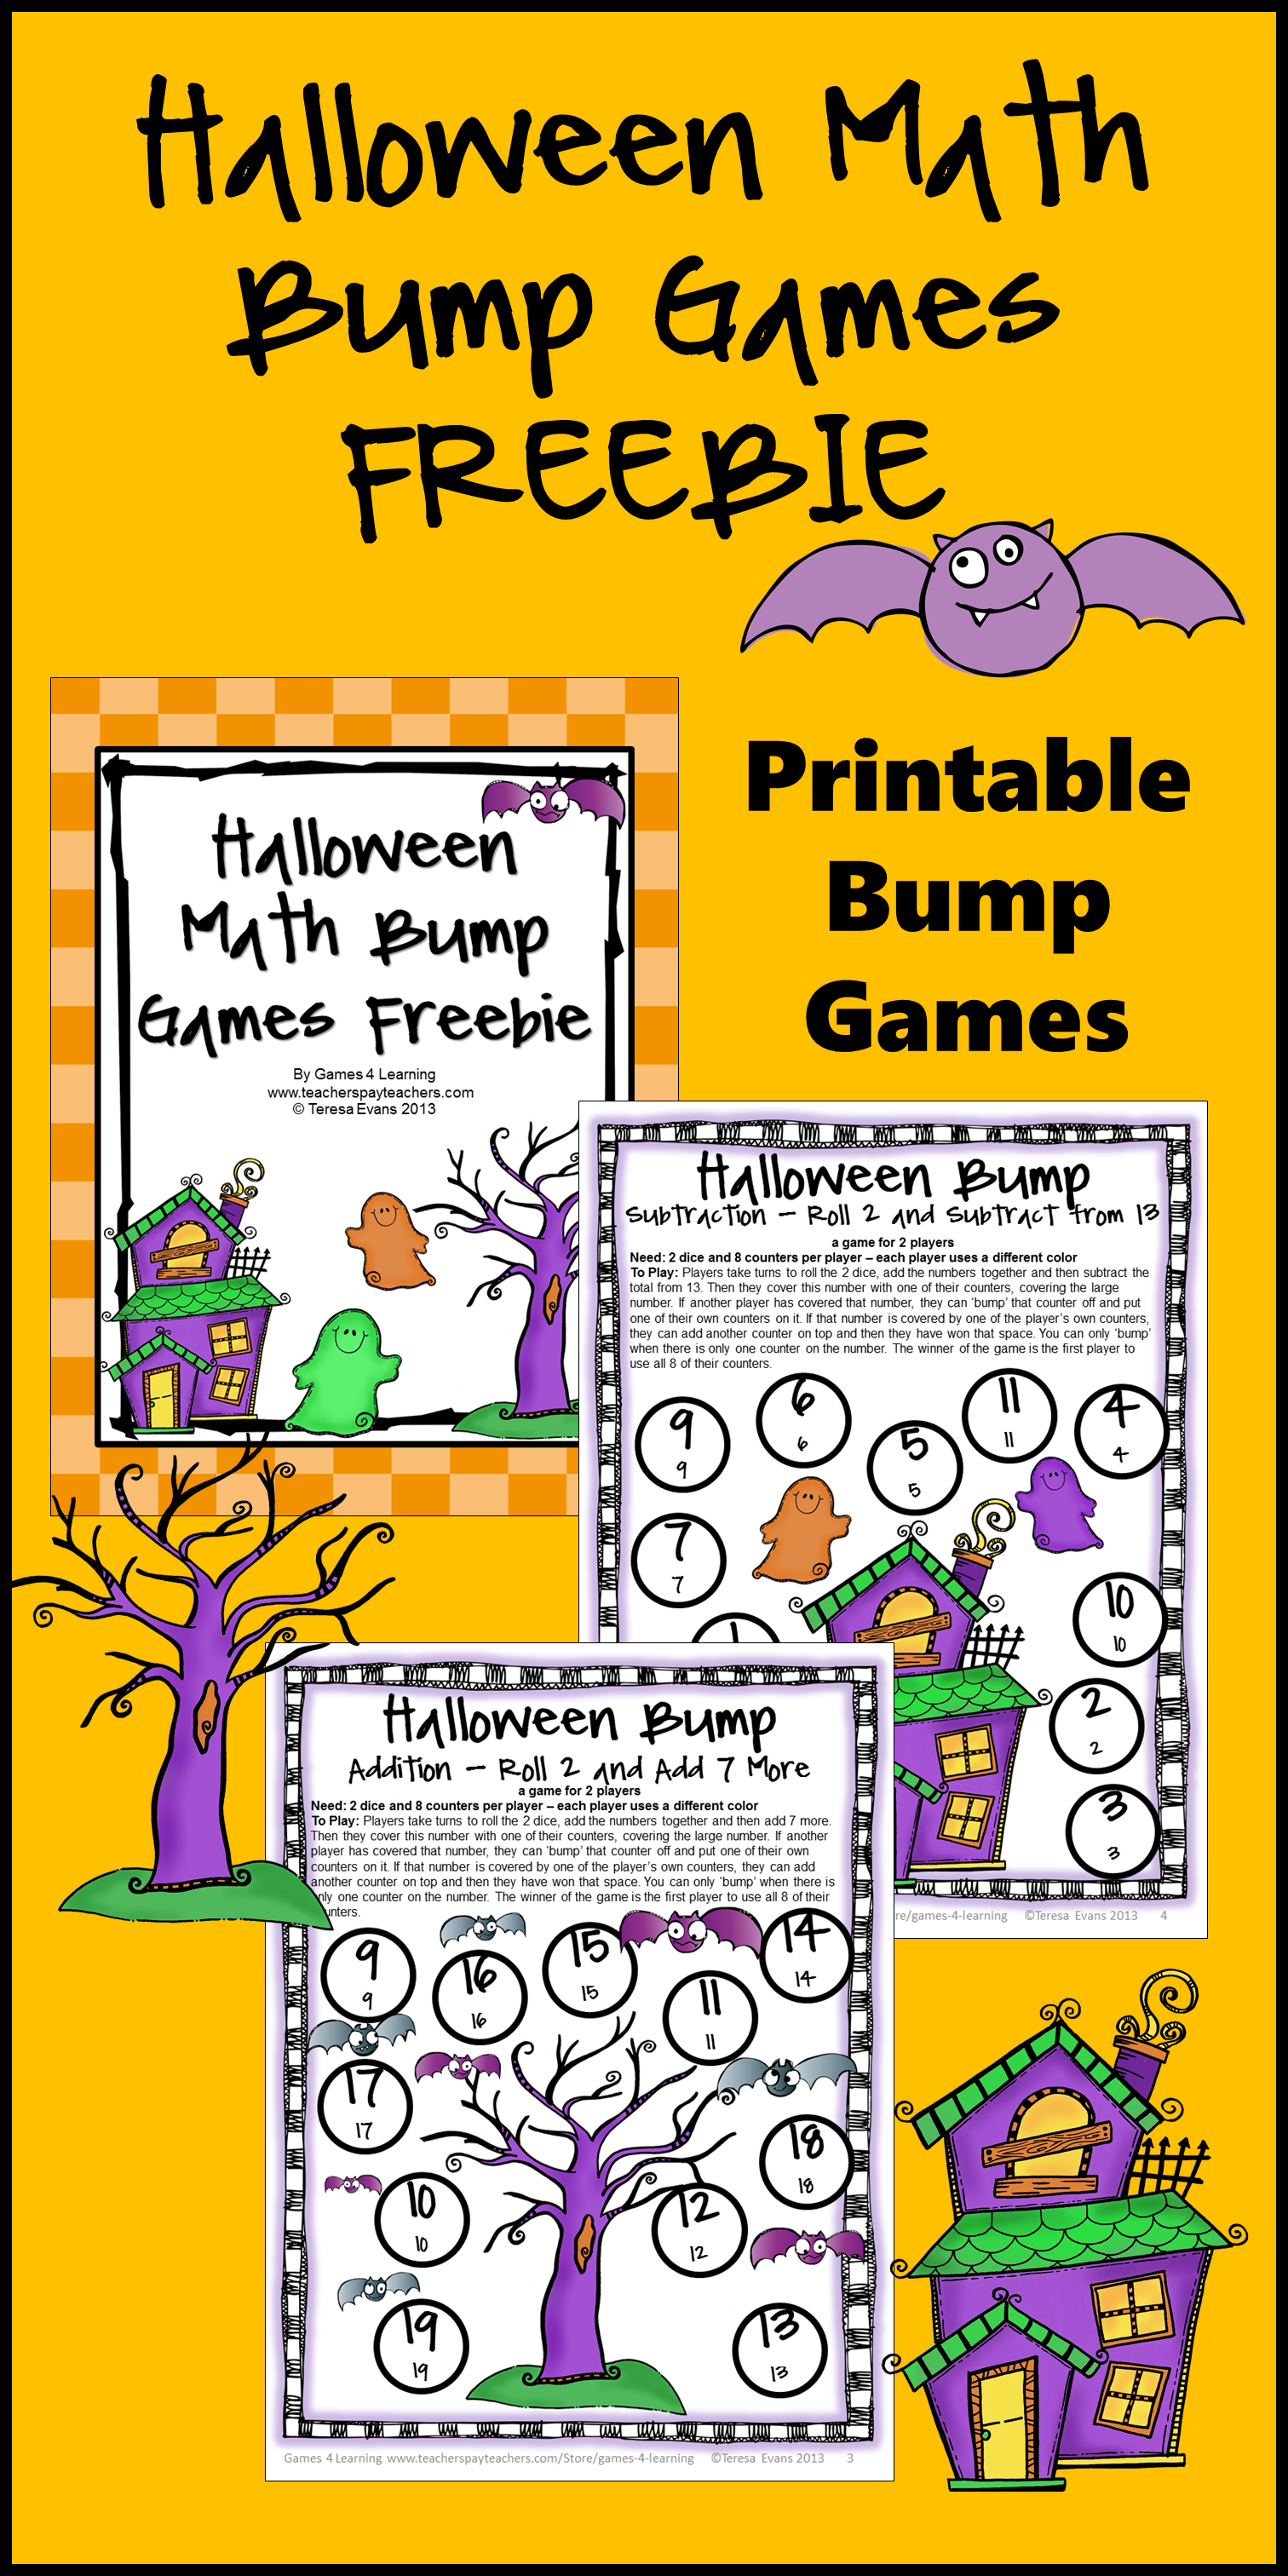 Halloween Free Math Games Fun Halloween Math Activities Halloween Bump Games